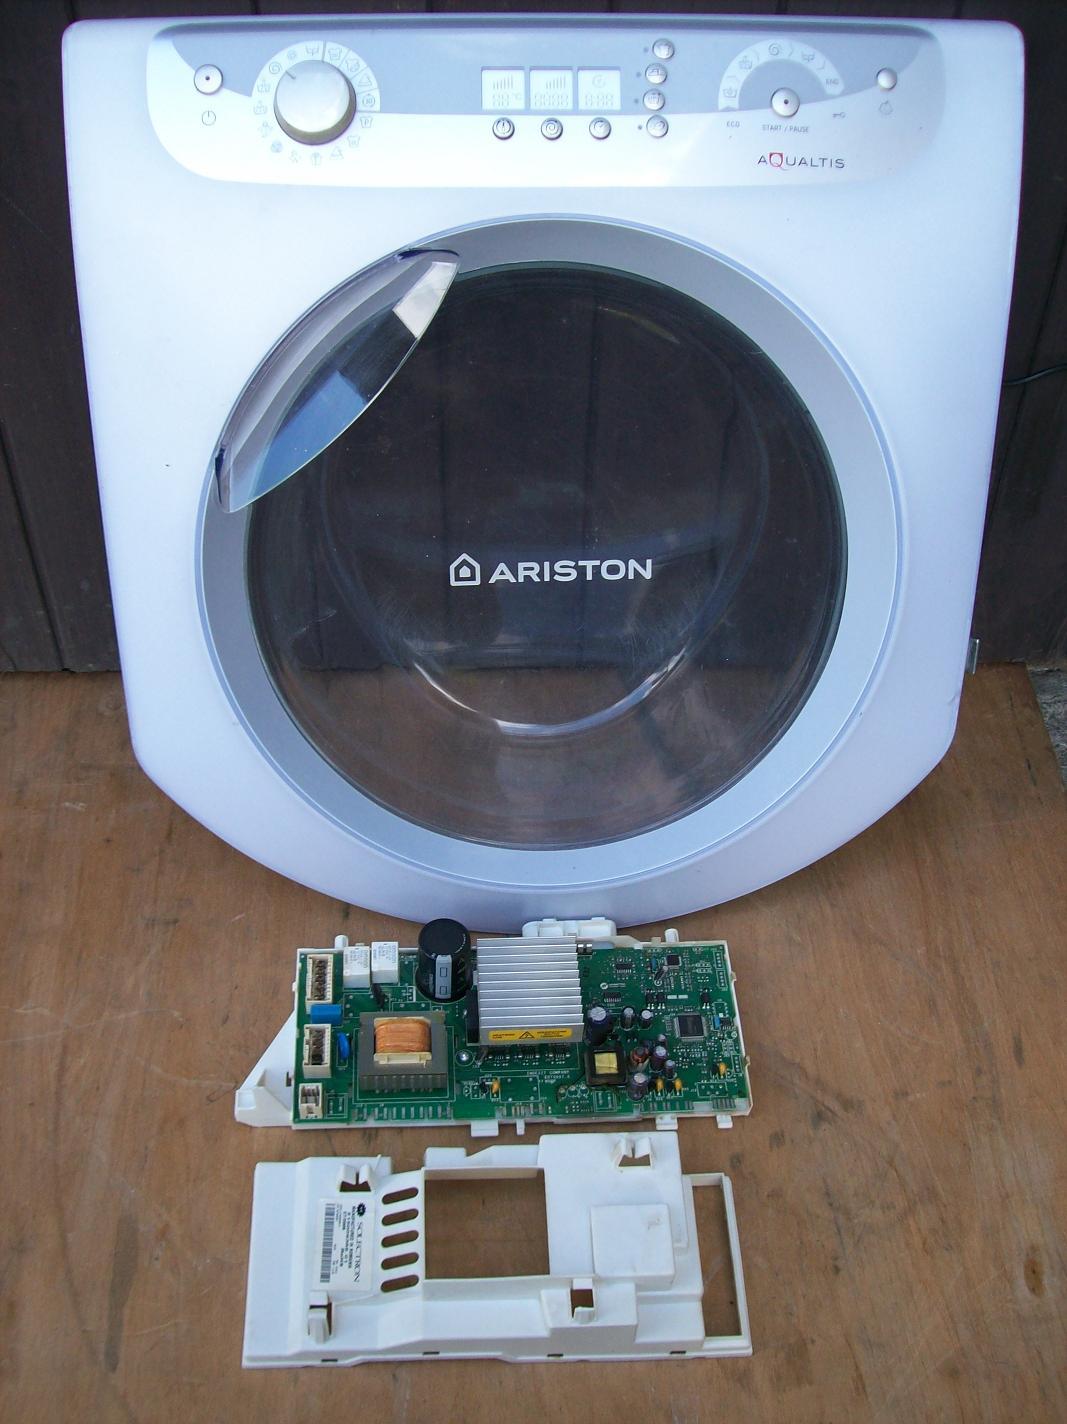 Ariston aqxxf 129 h manual coveprogs for Manuale ariston